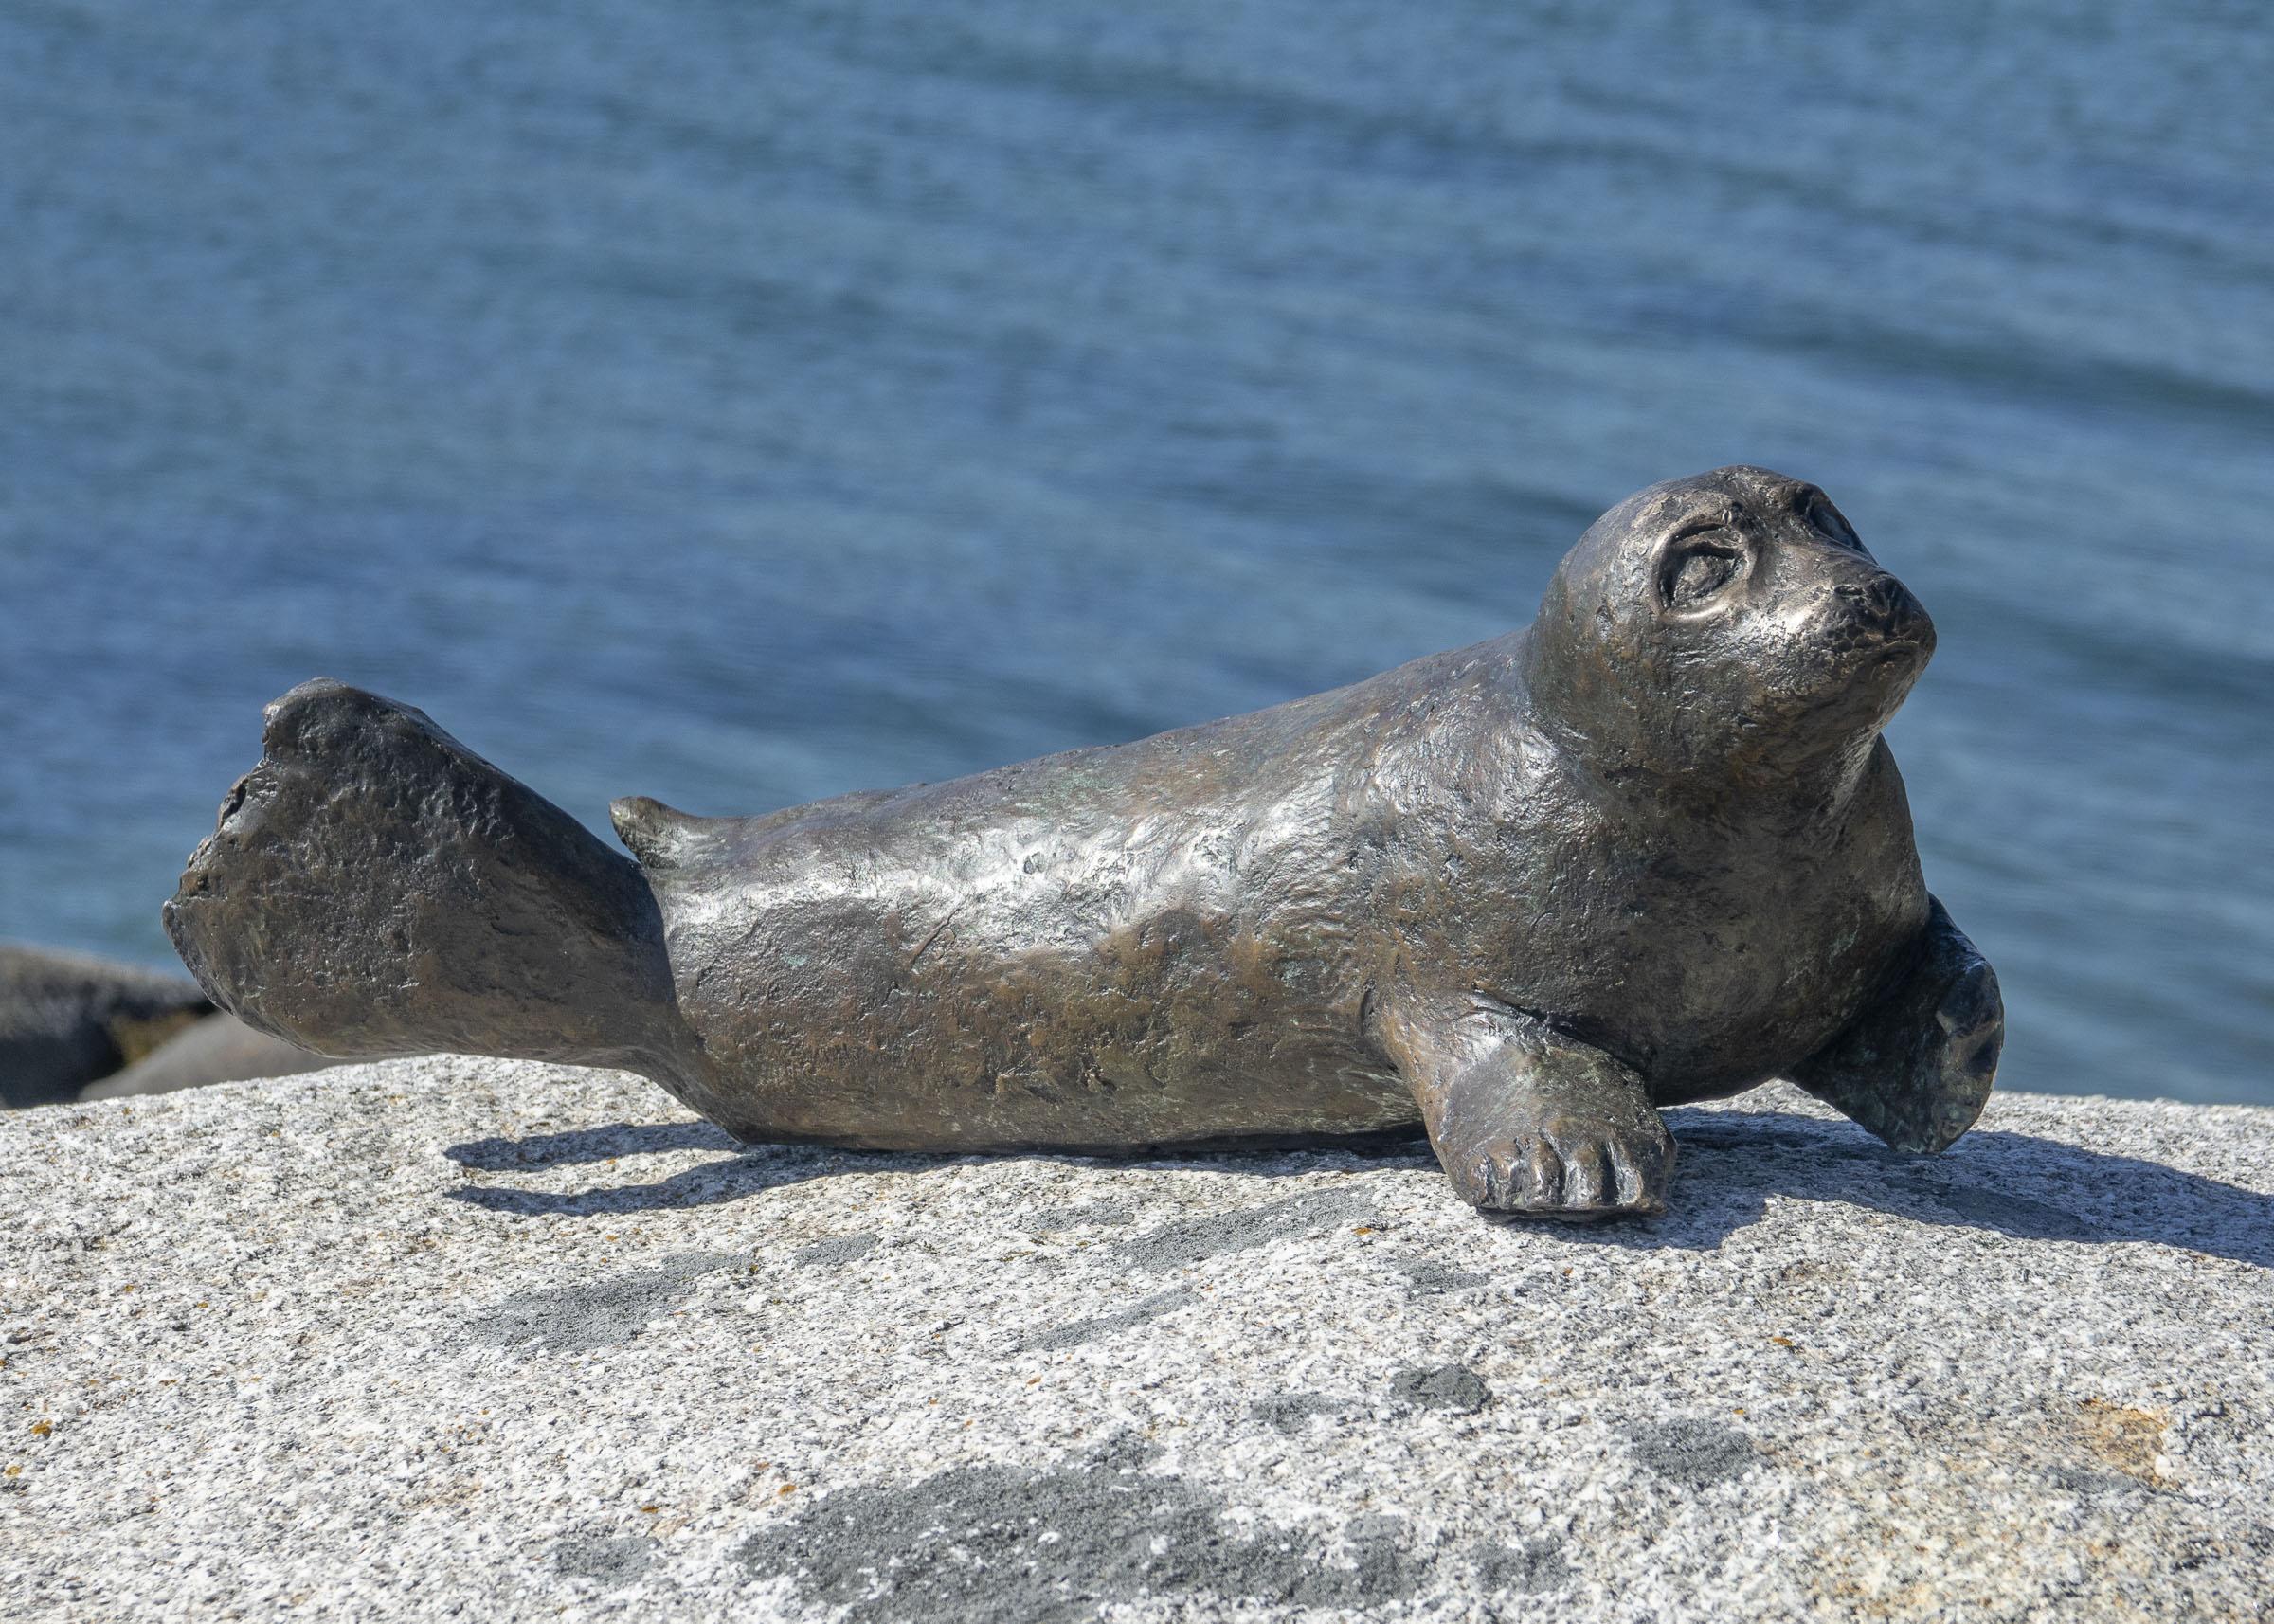 Raye-Owl-Seal-Rabbit-3-21_dsc3279